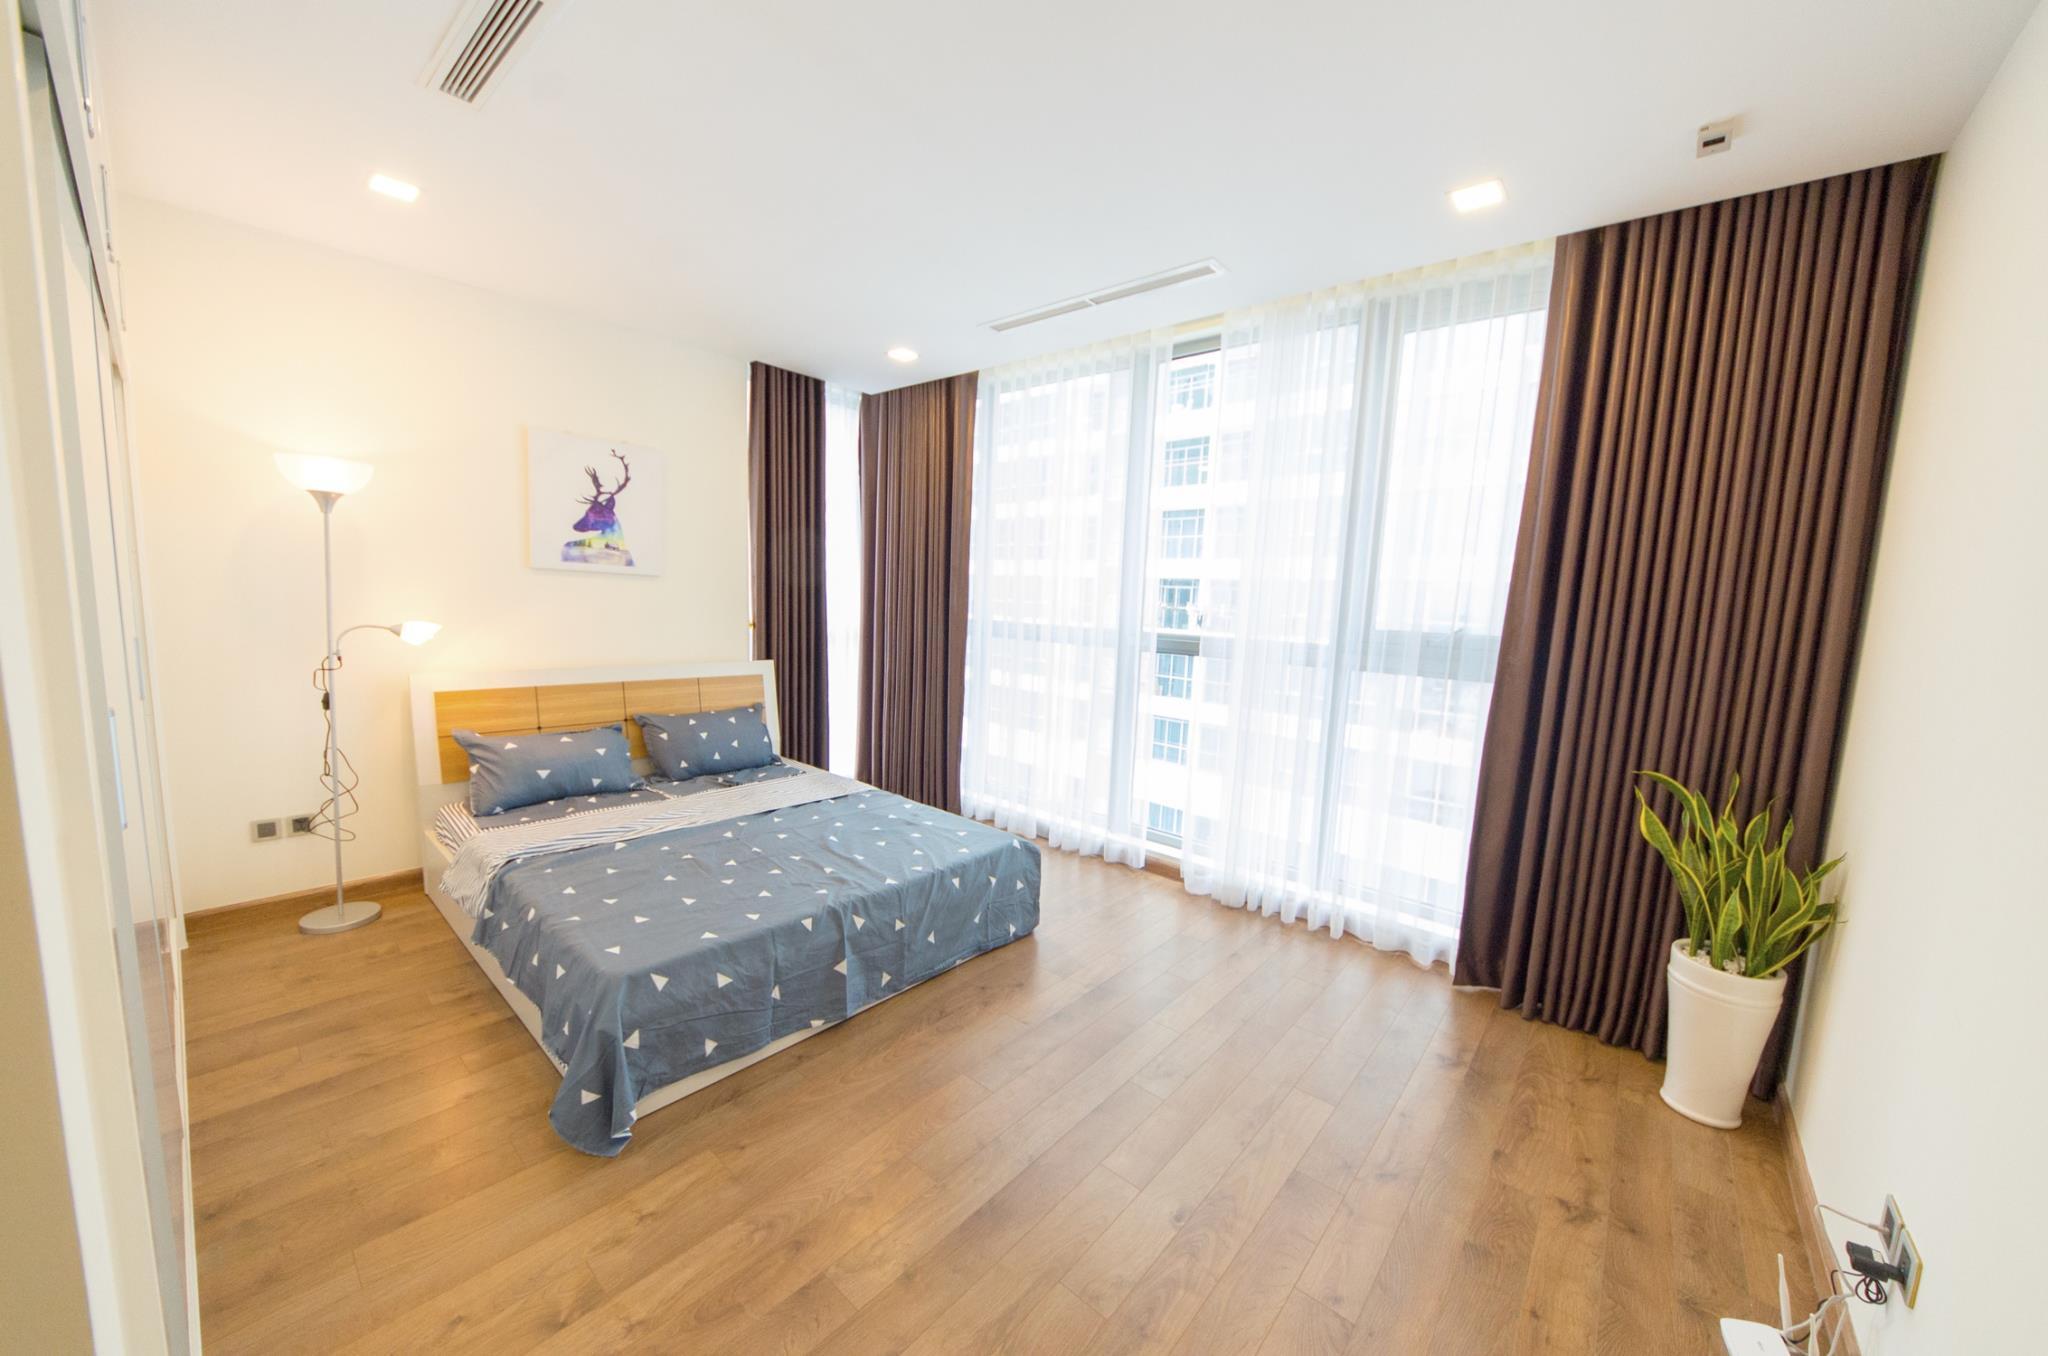 3 Bedroom Spacious And Elegant Apartment